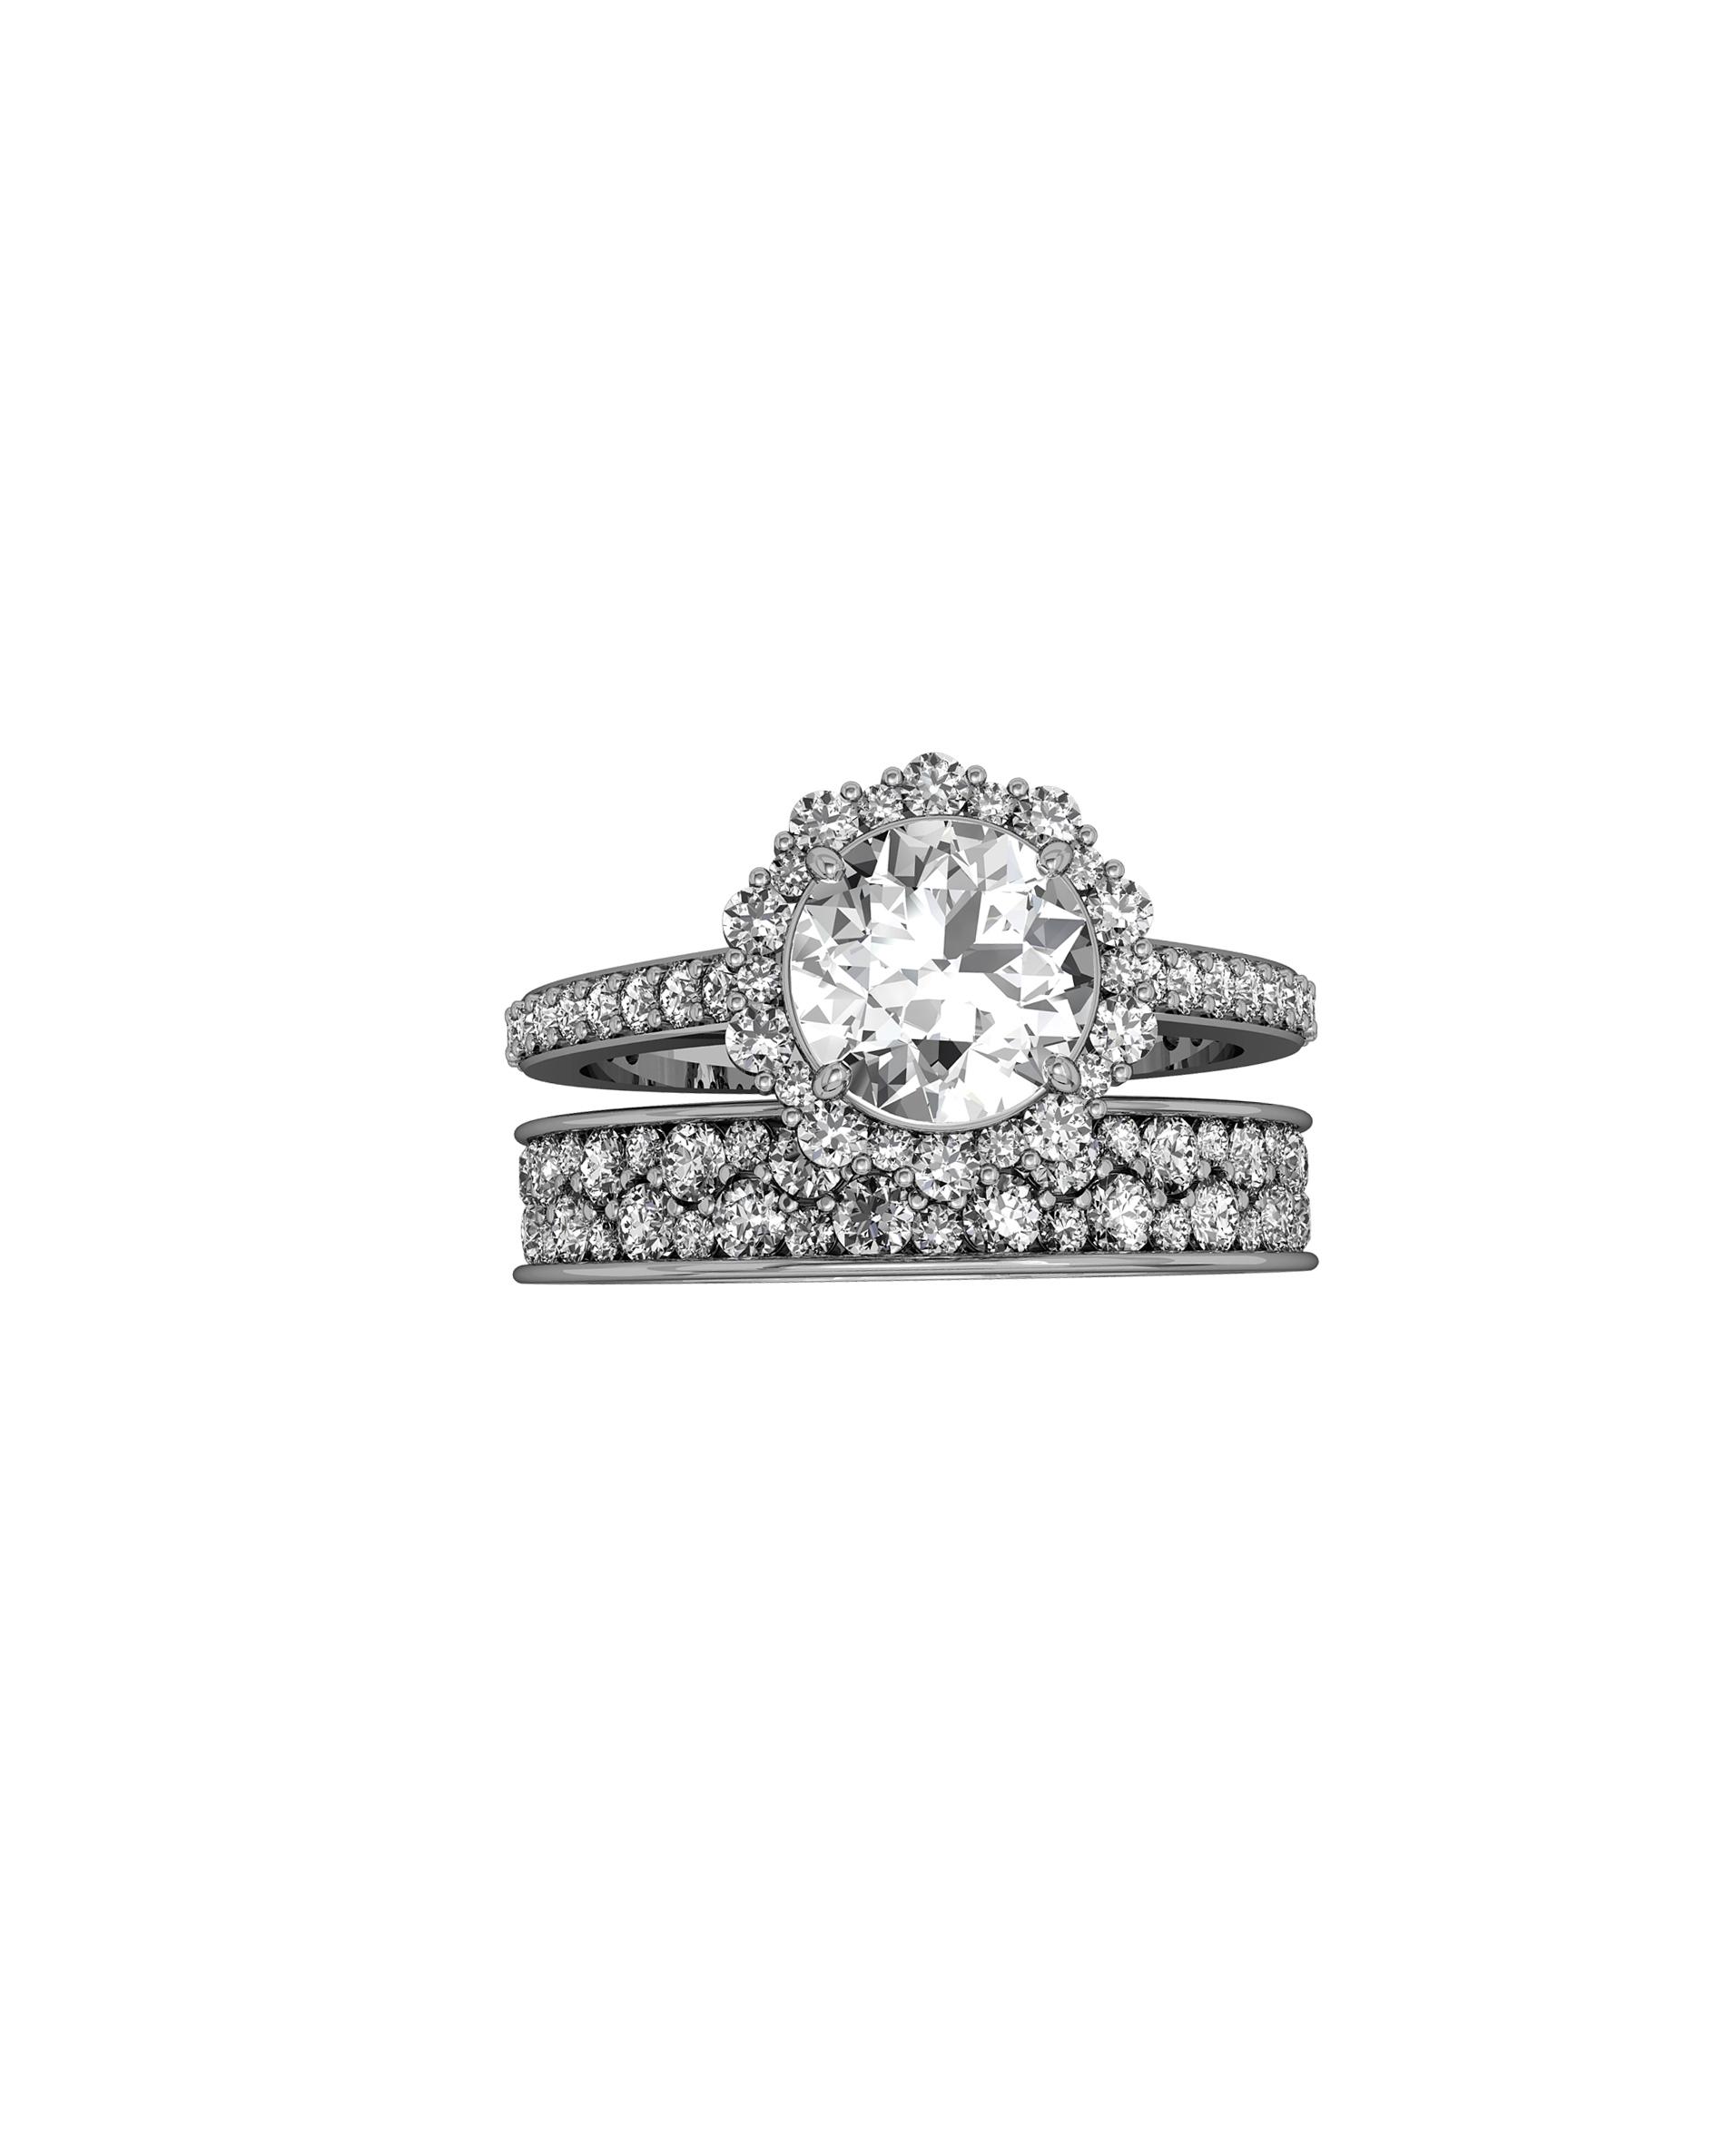 designer diamond bridal jewelry-2-2.jpg